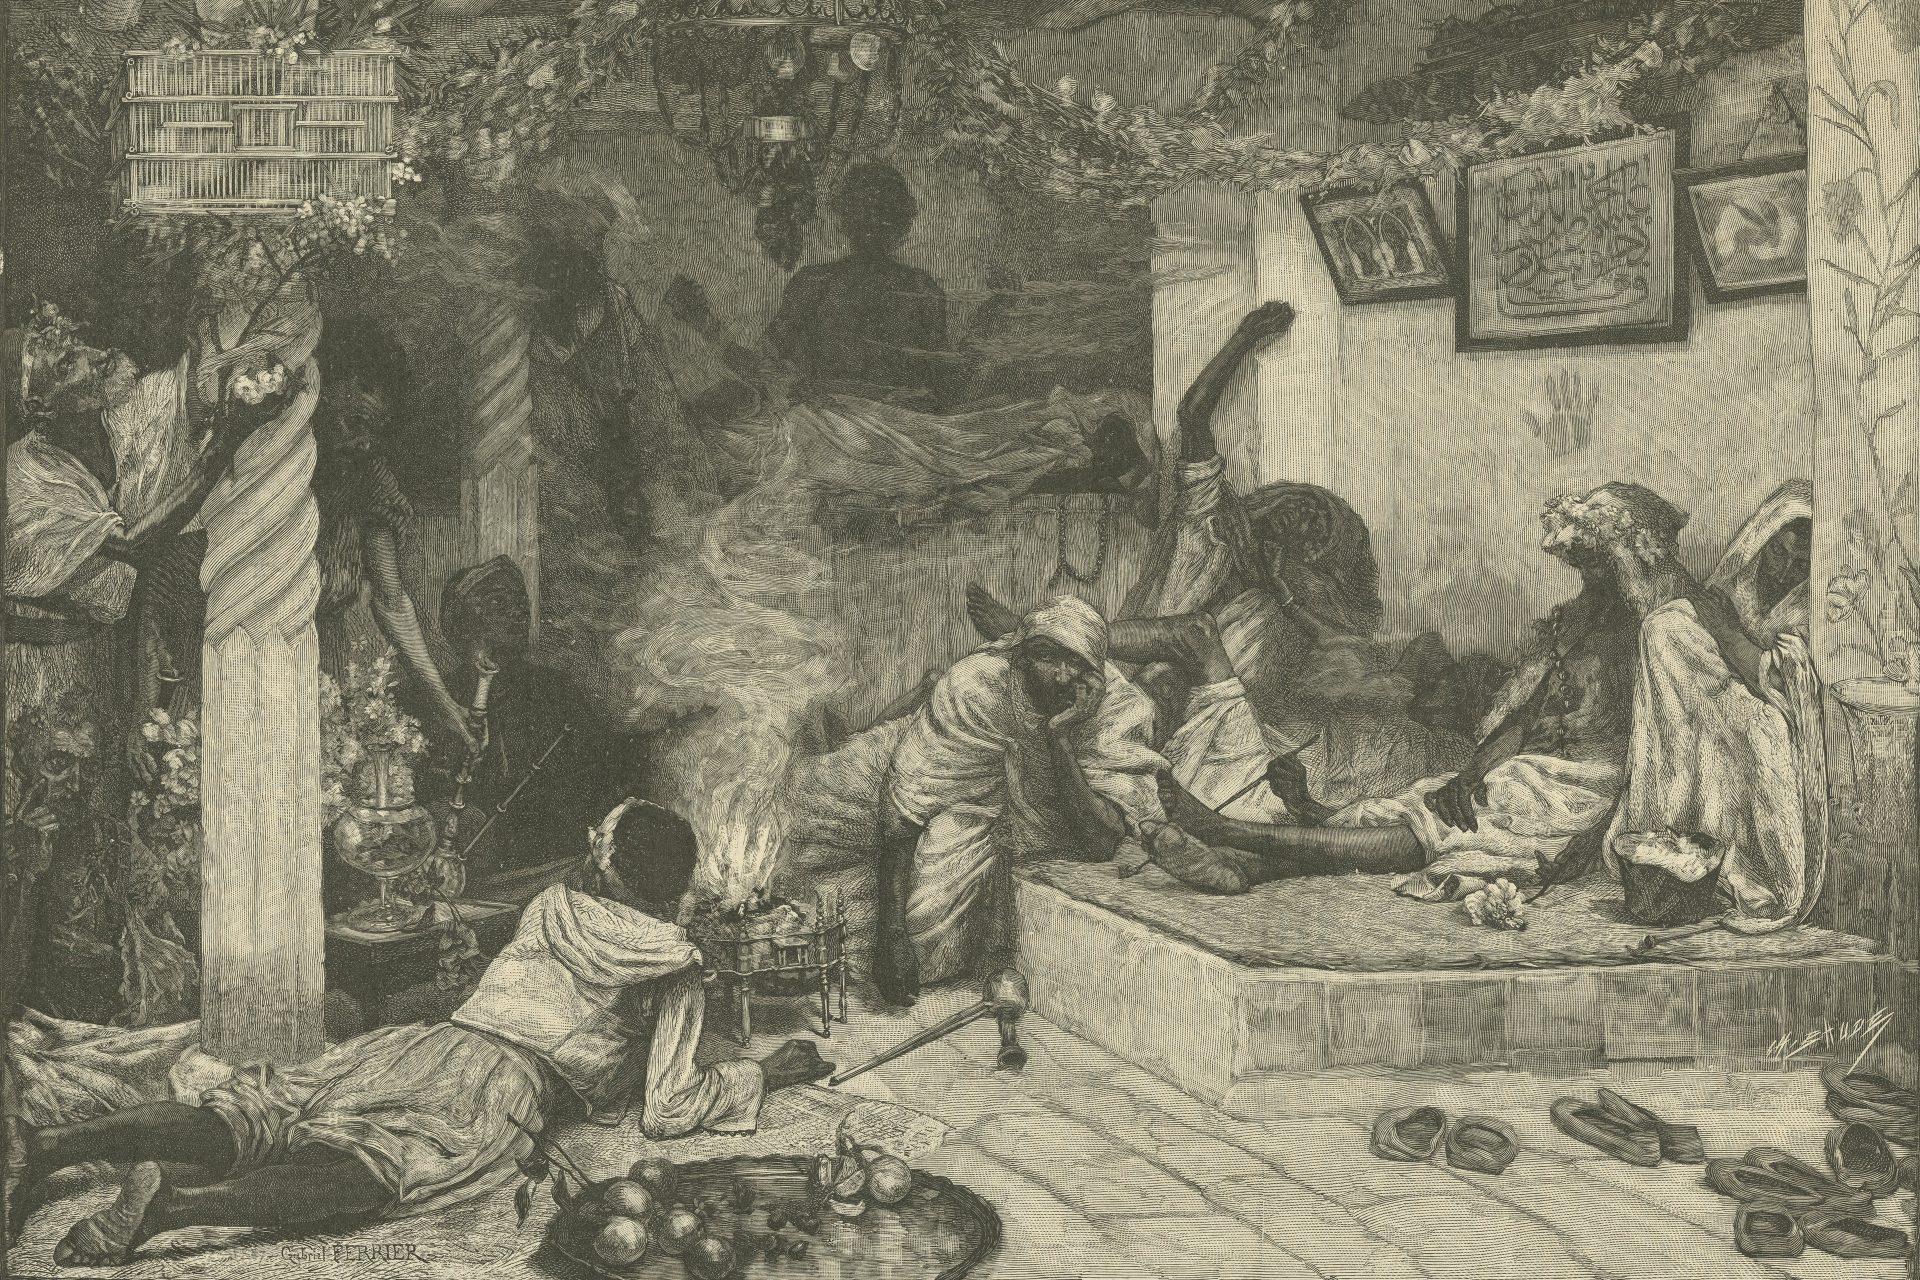 After M. Gabriel Ferrier, Smoking Kiff, 19th century. Etching.